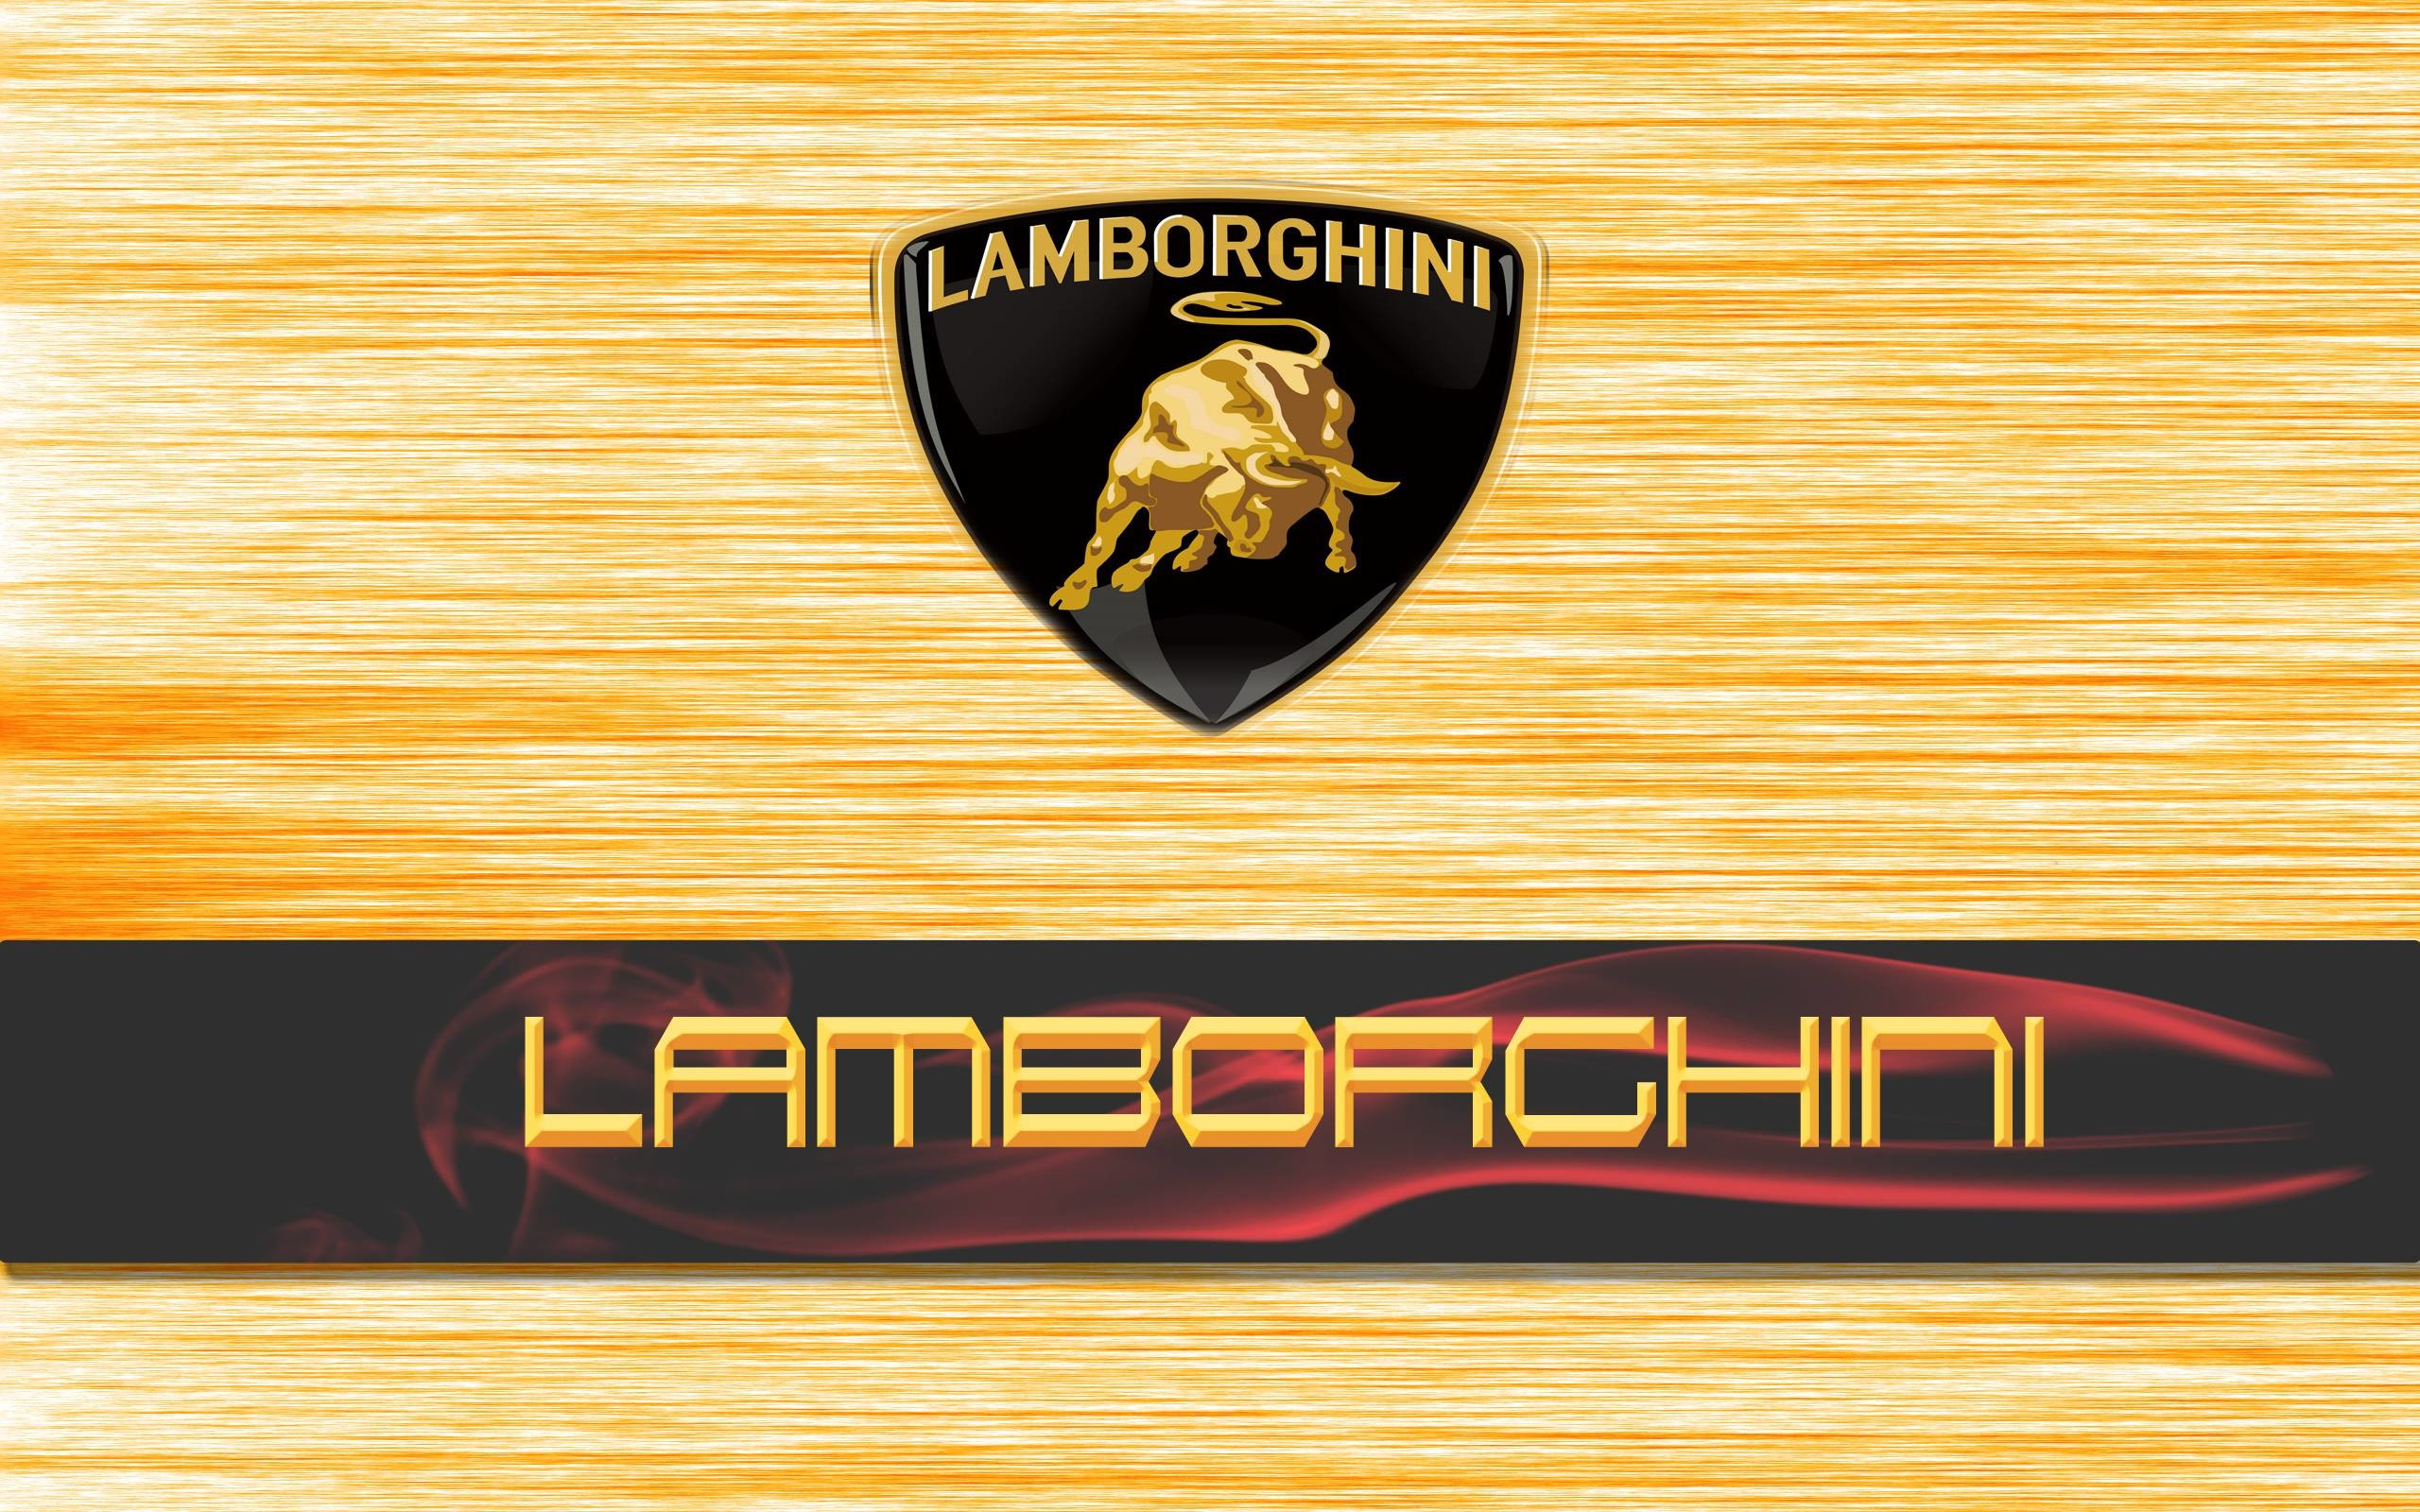 Most Downloaded Lamborghini Logo Wallpapers – Full HD wallpaper search